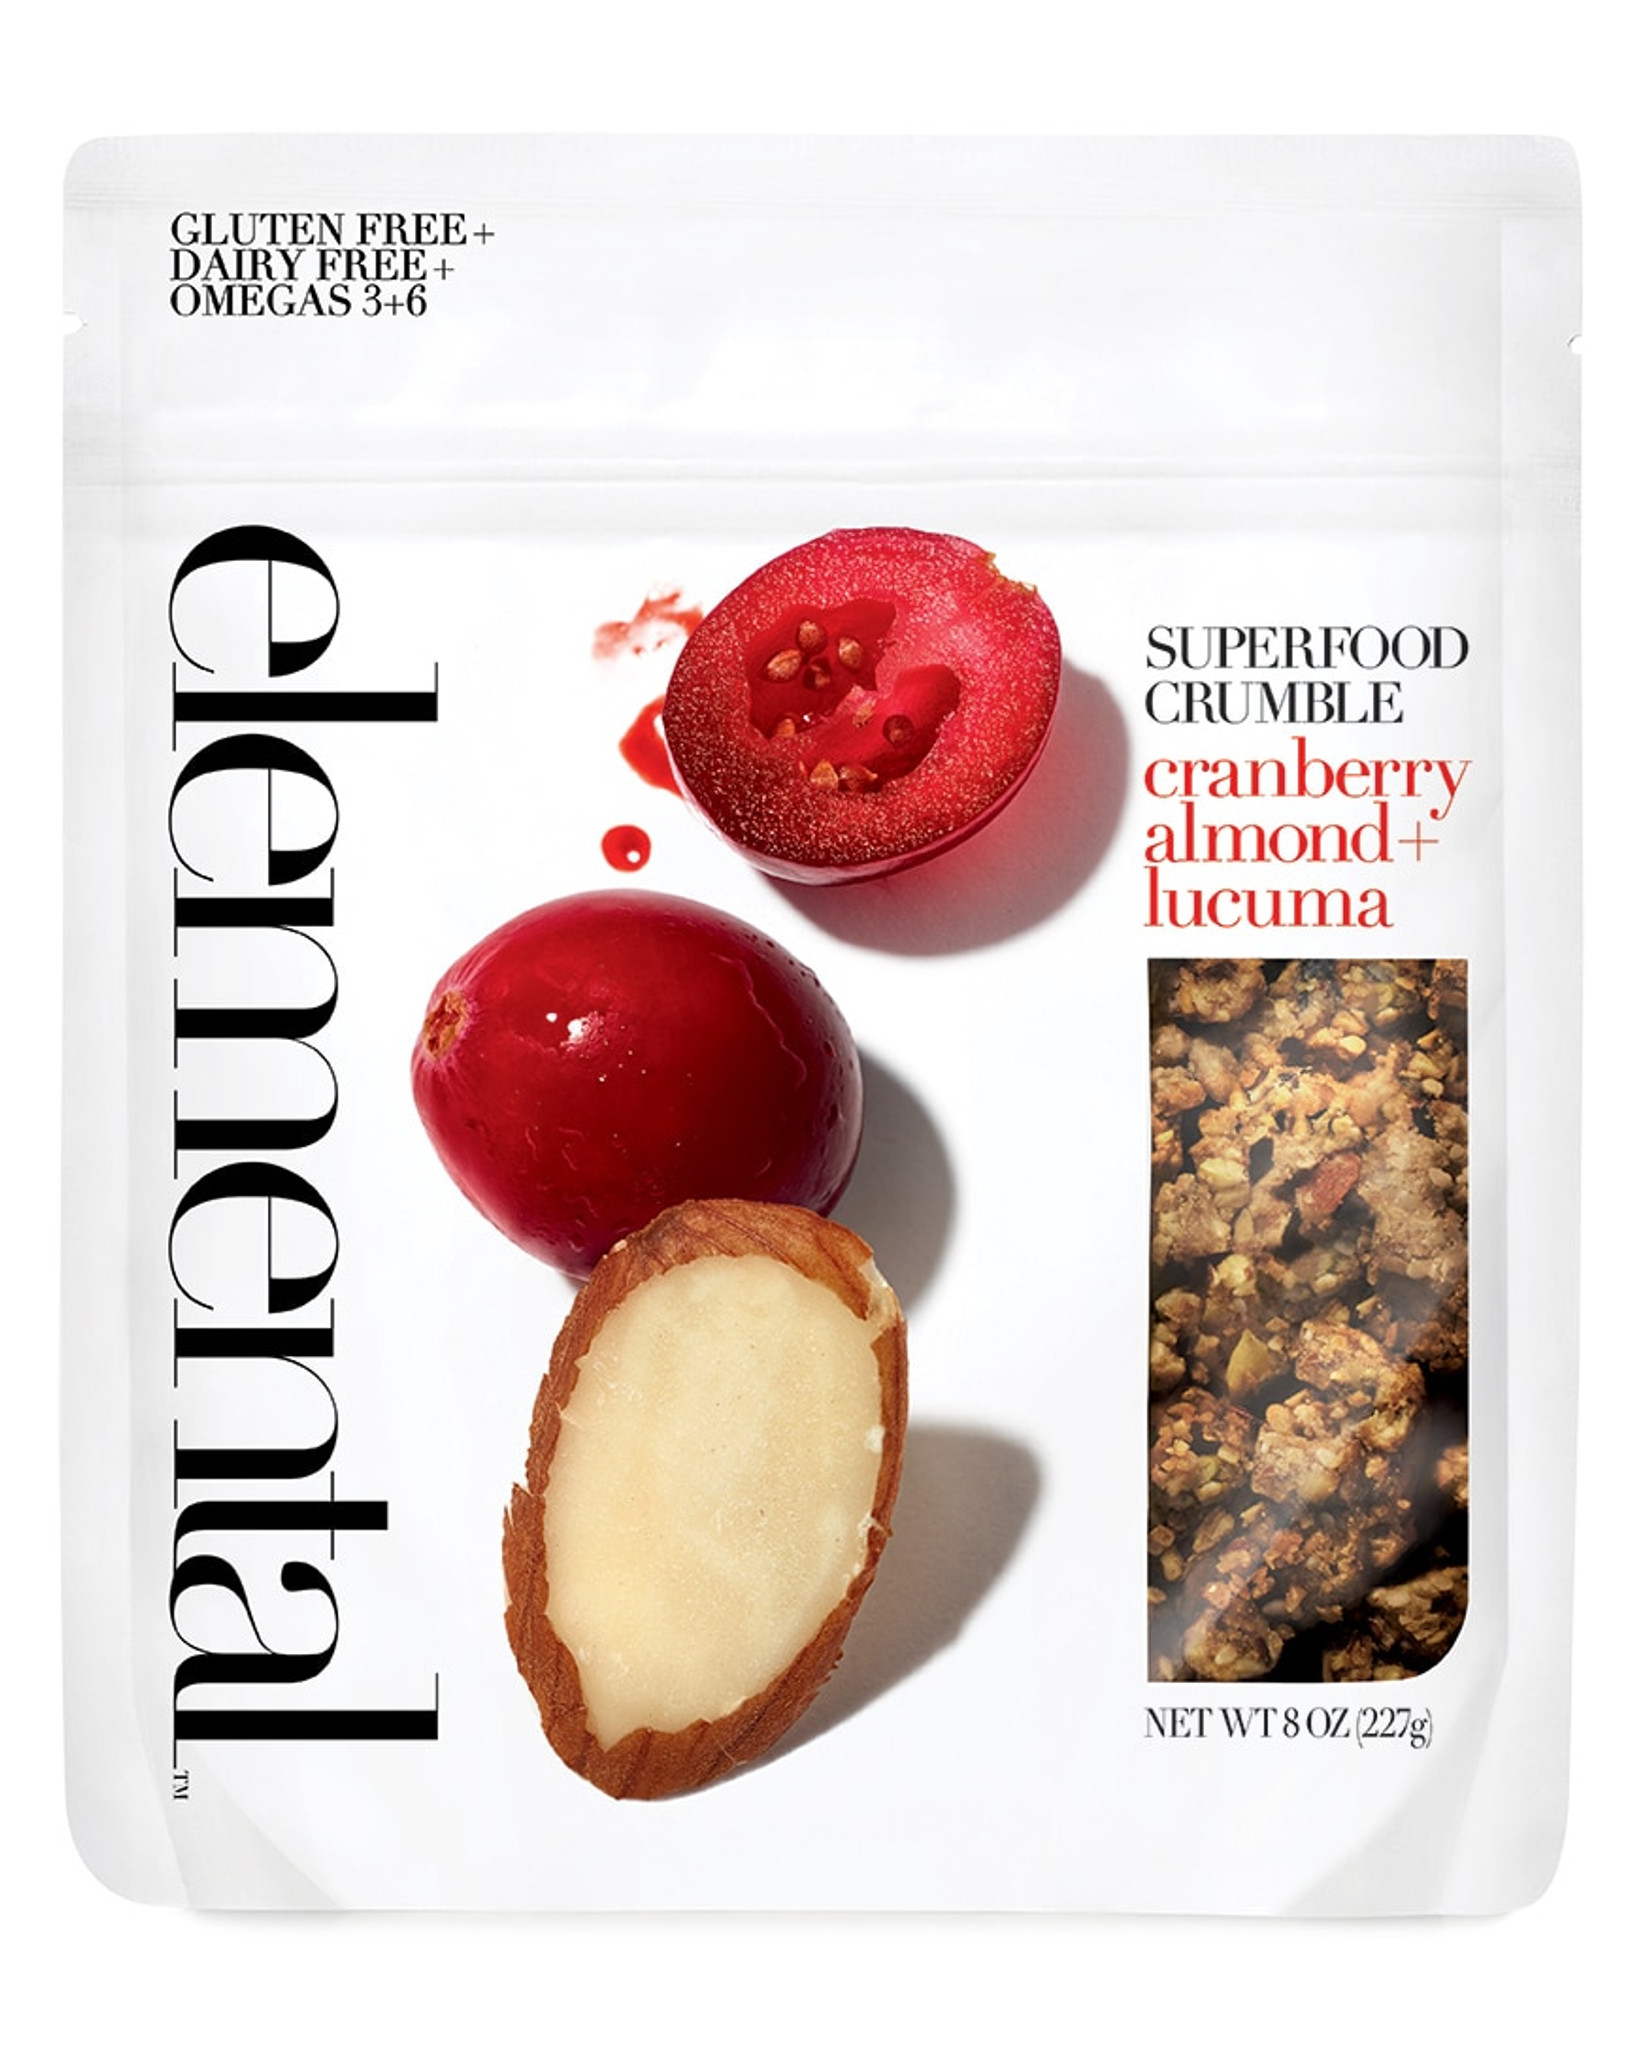 Crumble Cranberry Almond + Lucuma